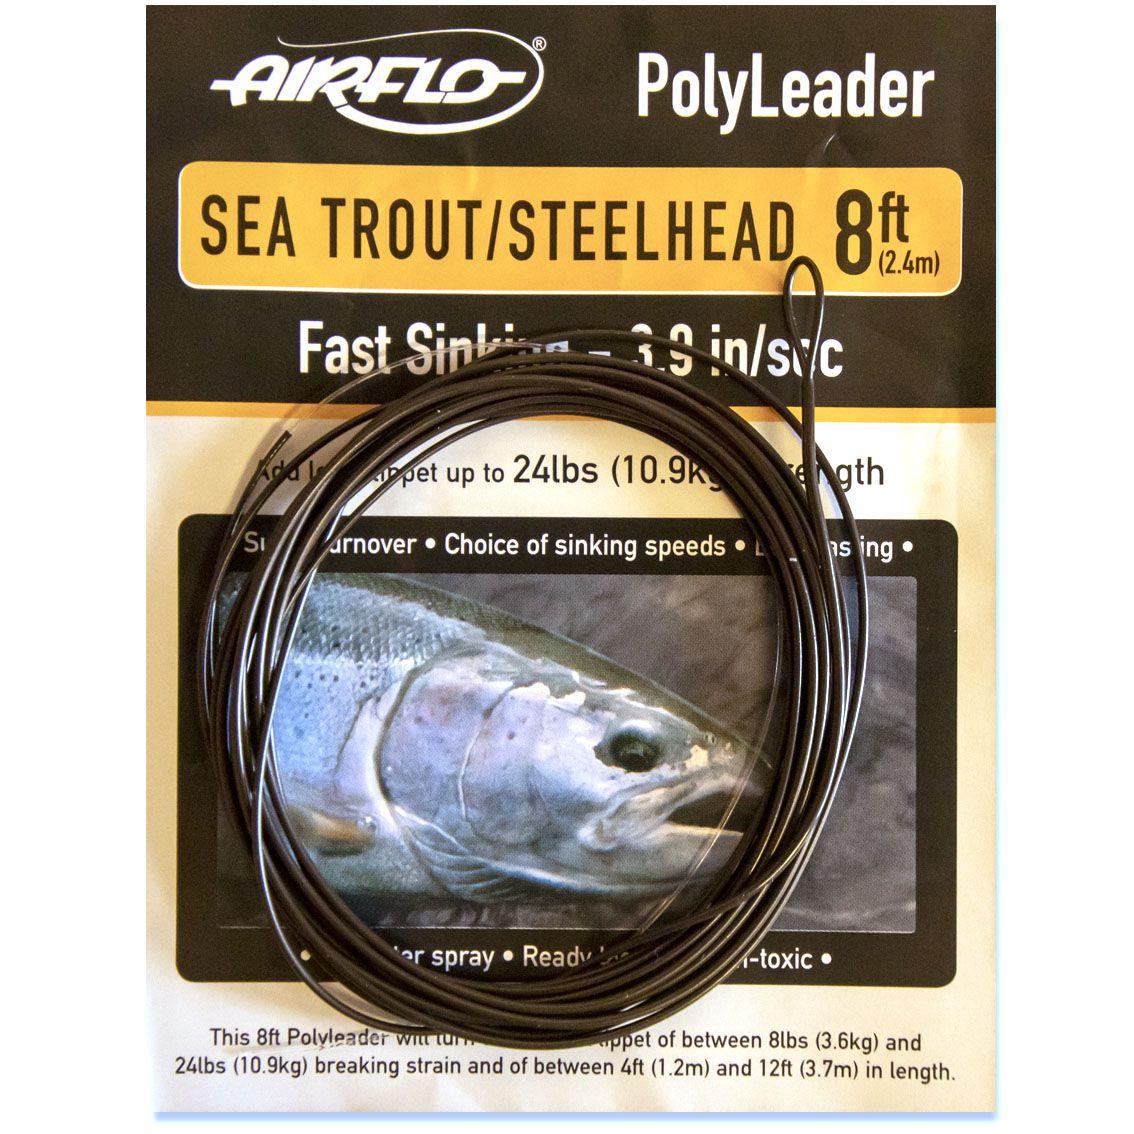 Polyleader Airflo Sea Trout Steelhead 8' (Fast Sinking)